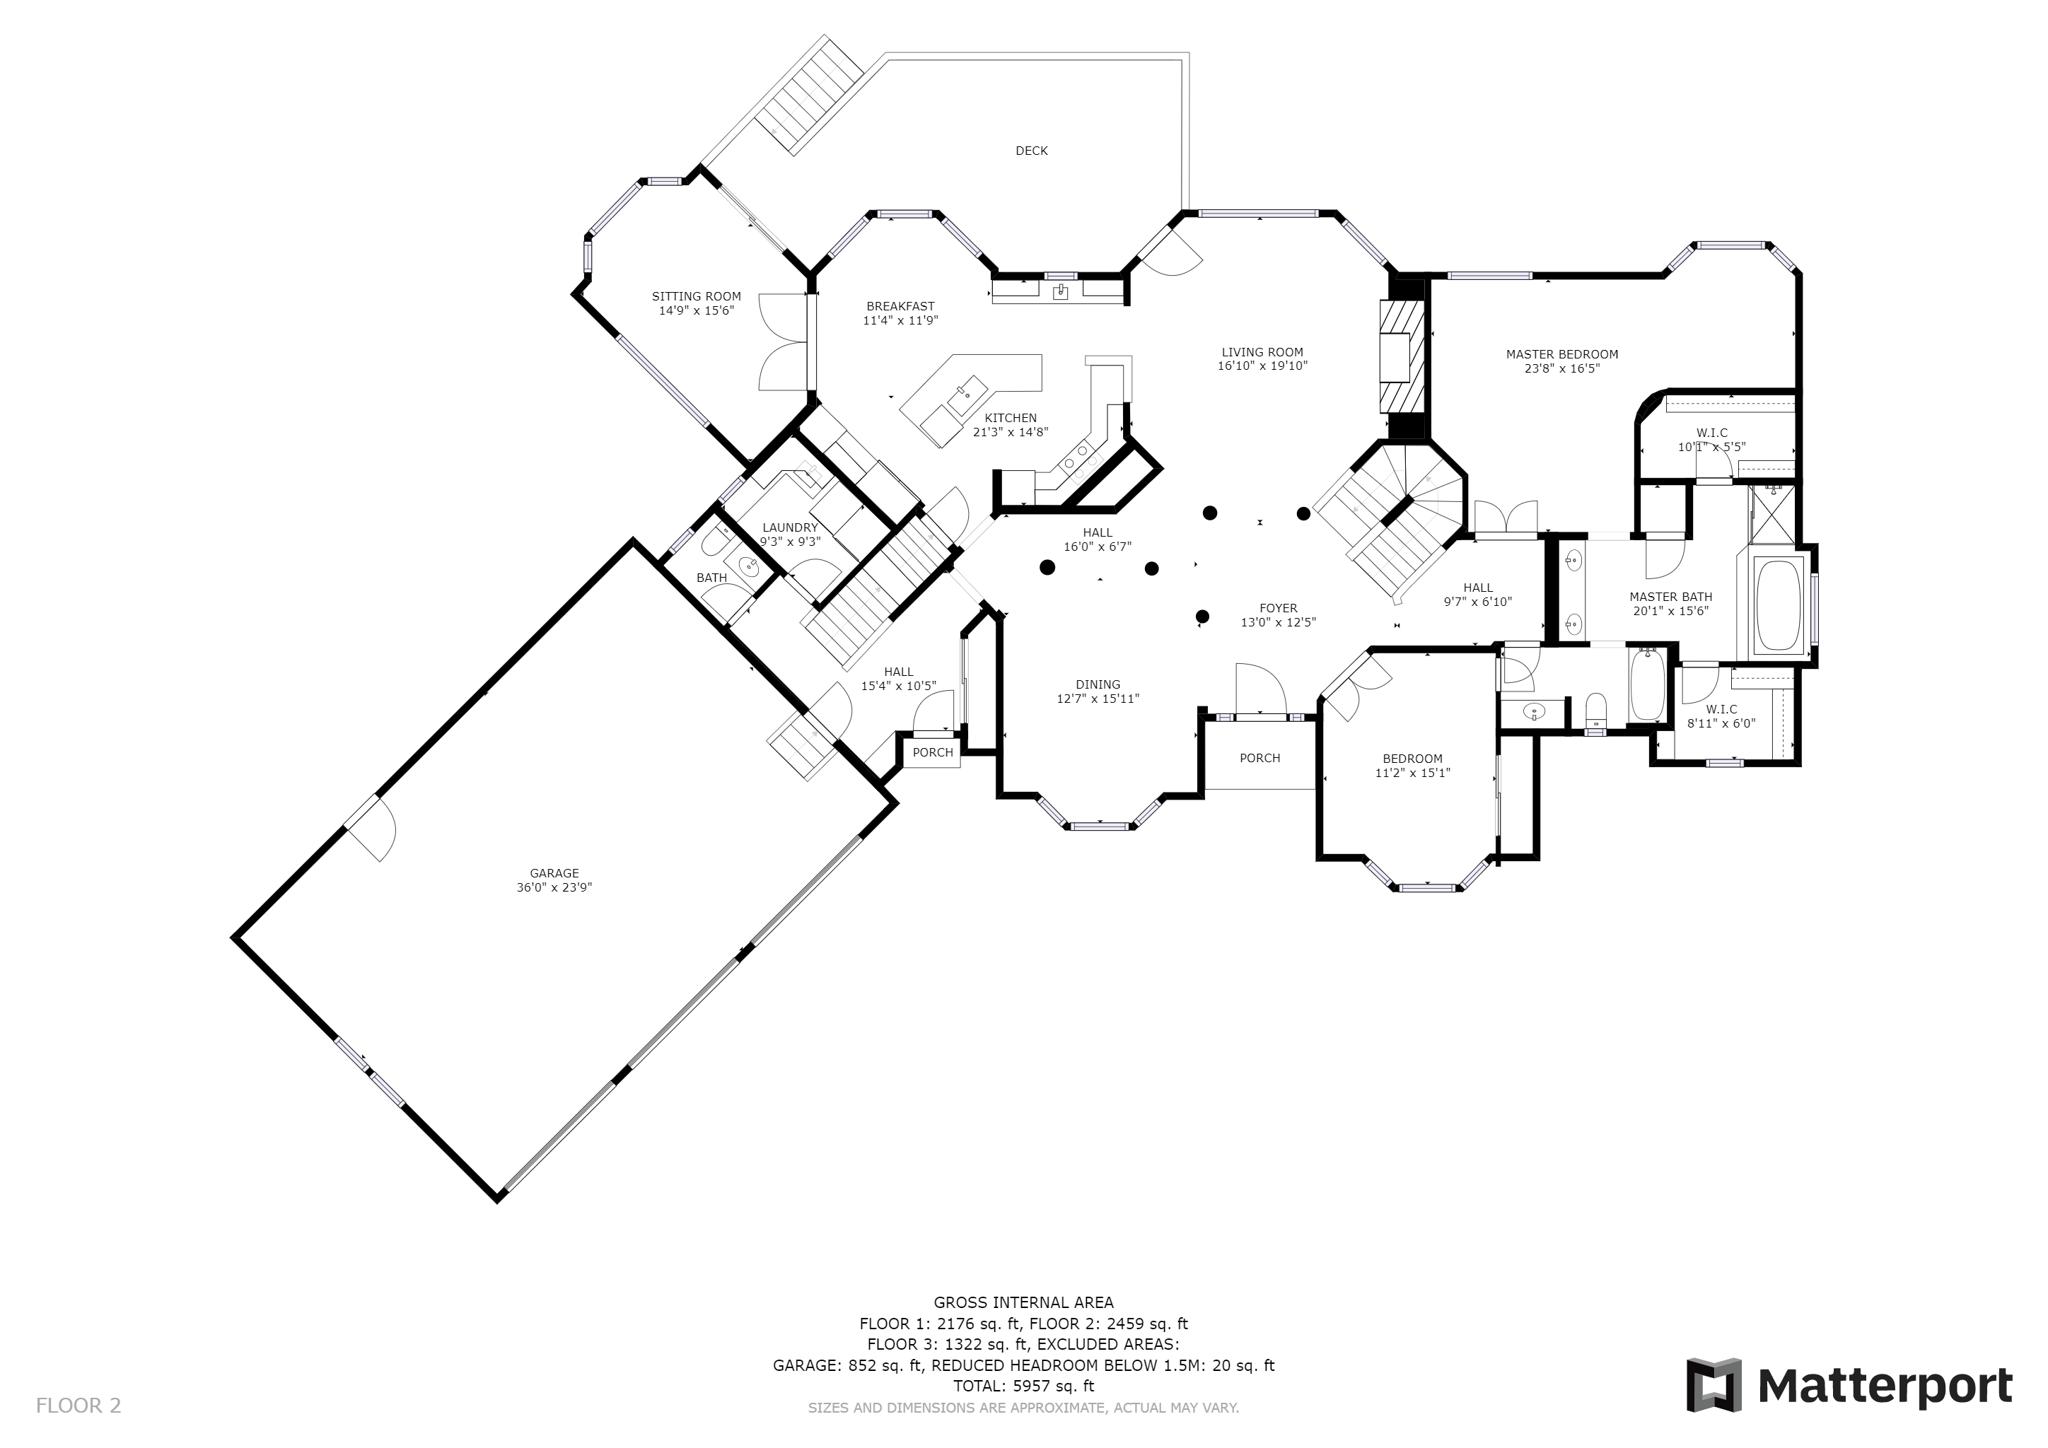 Floorplan - Main Level